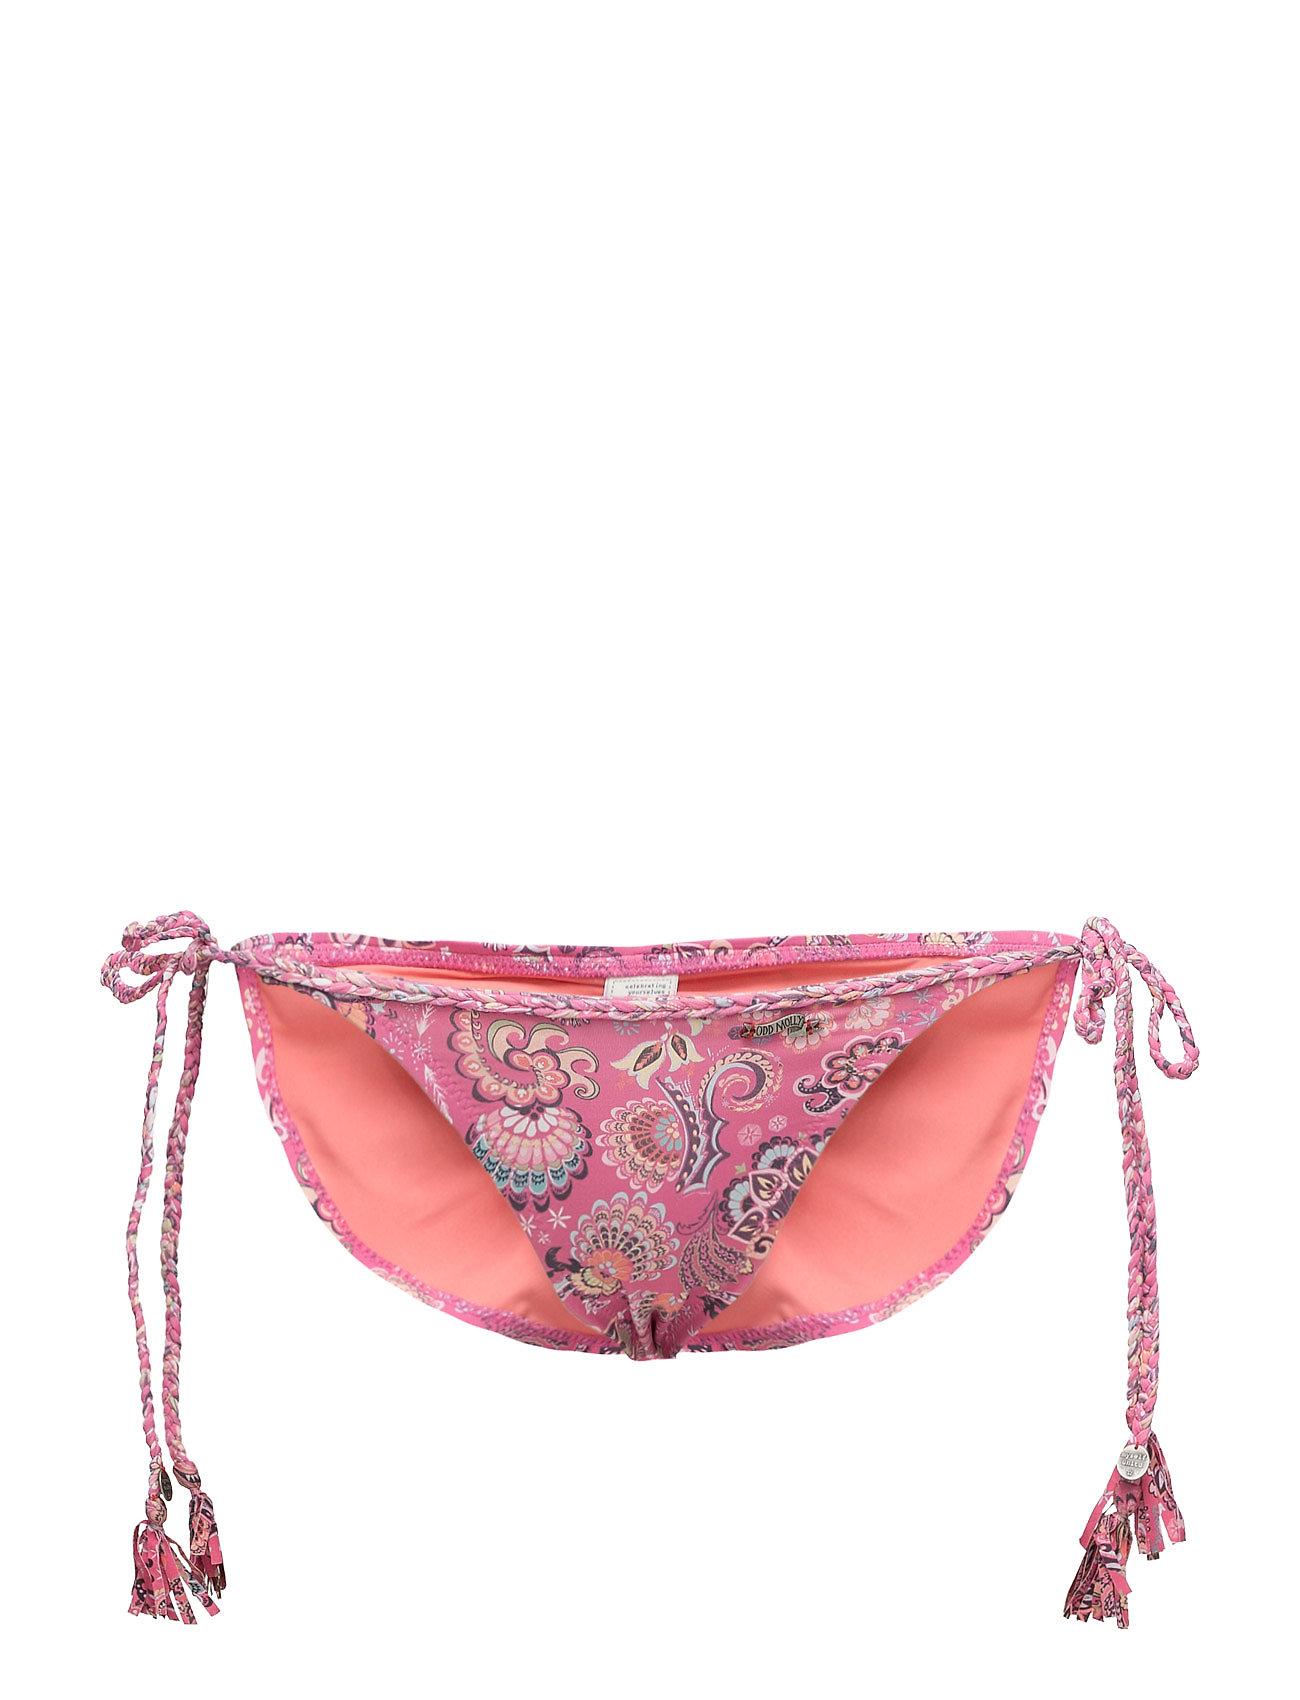 odd molly underwear & swimwear Safety triangle bikini bottom på boozt.com dk